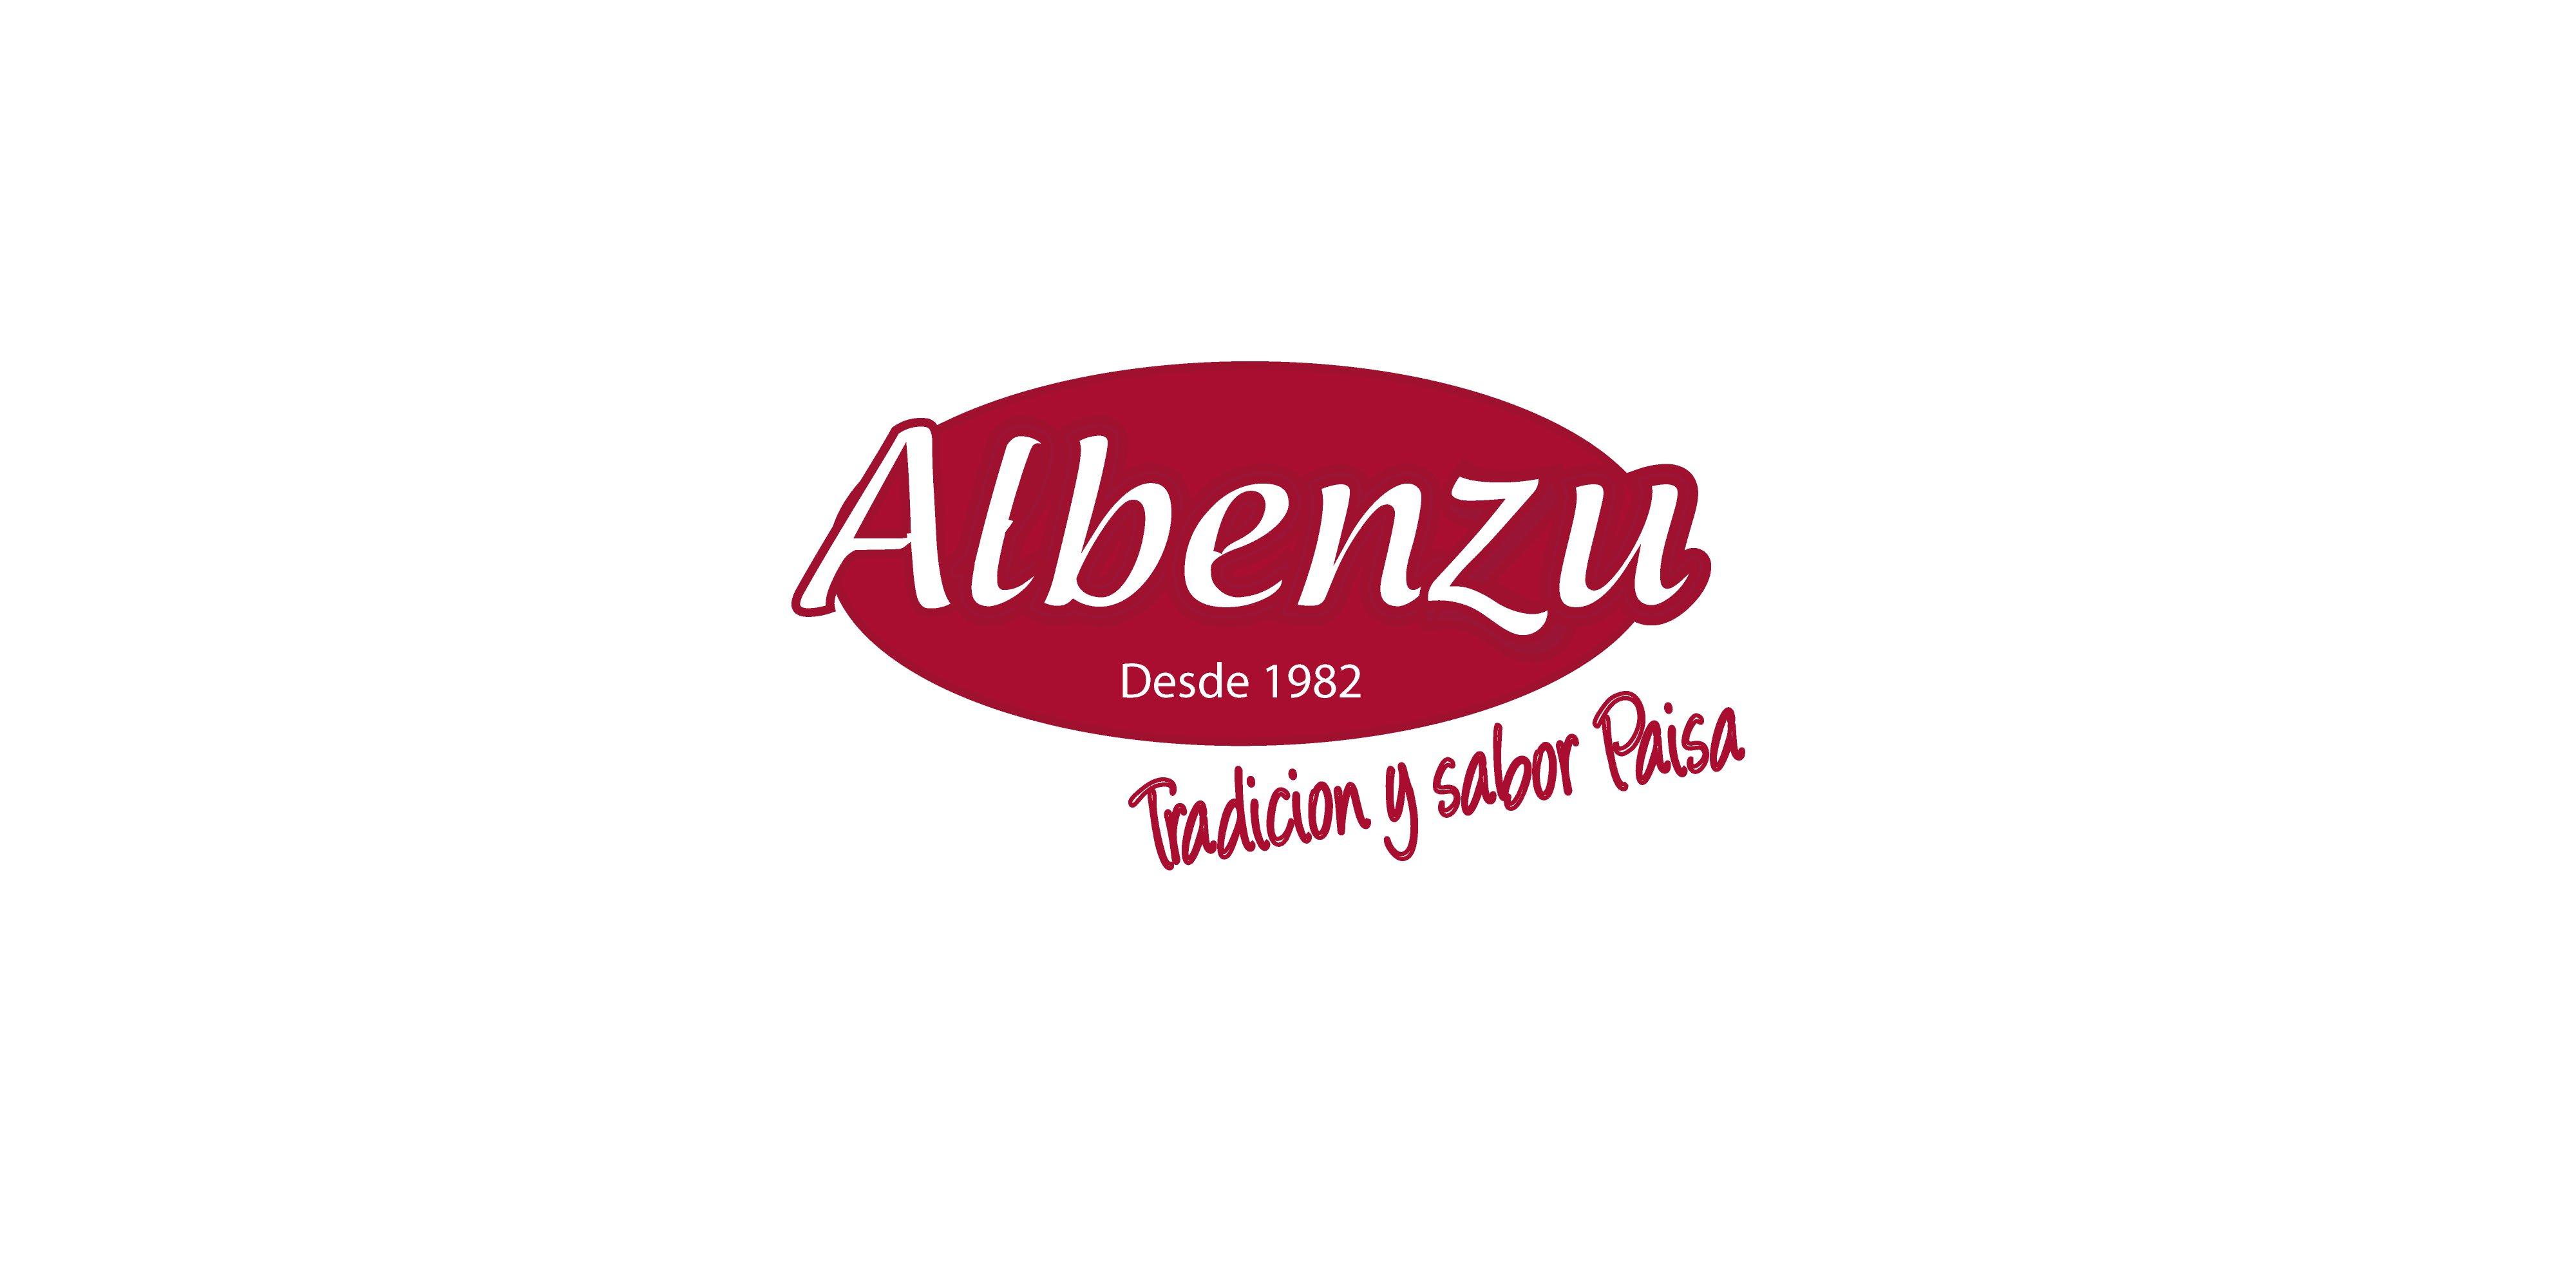 Albenzu Santa Gema